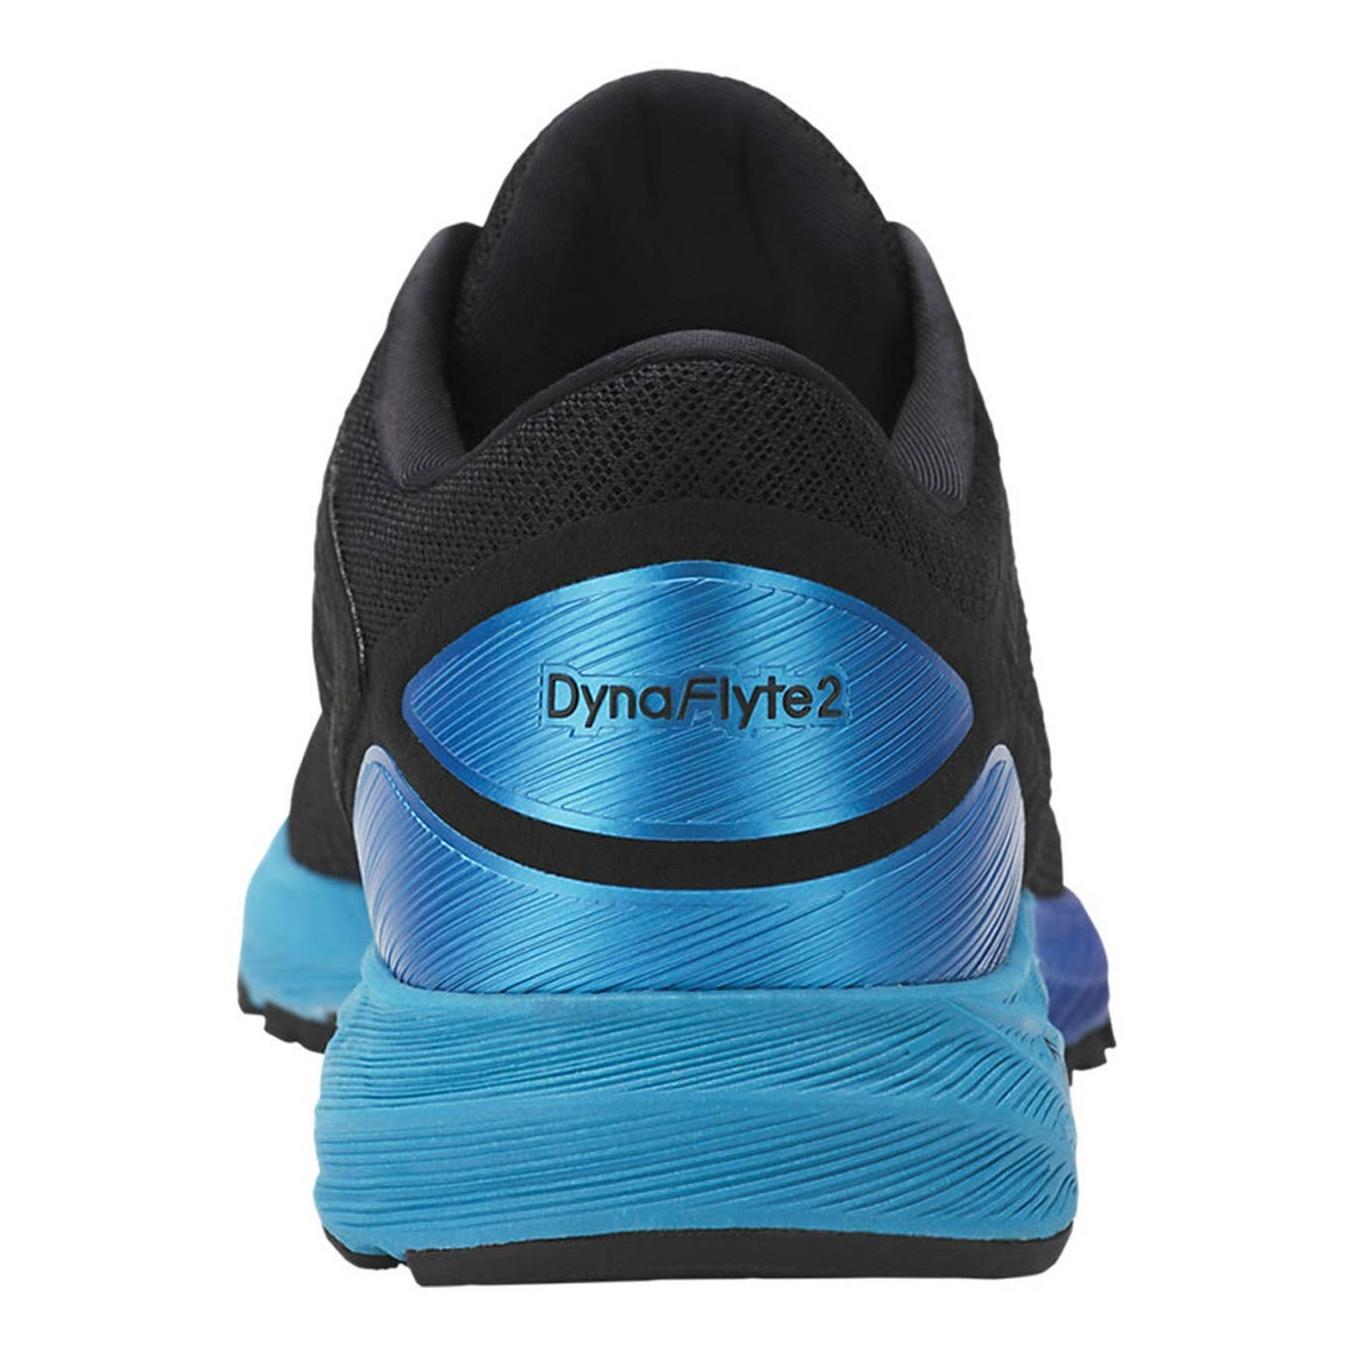 کفش دویدن بندی مردانه DynaFlyte 2 - اسیکس - مشکی - 4